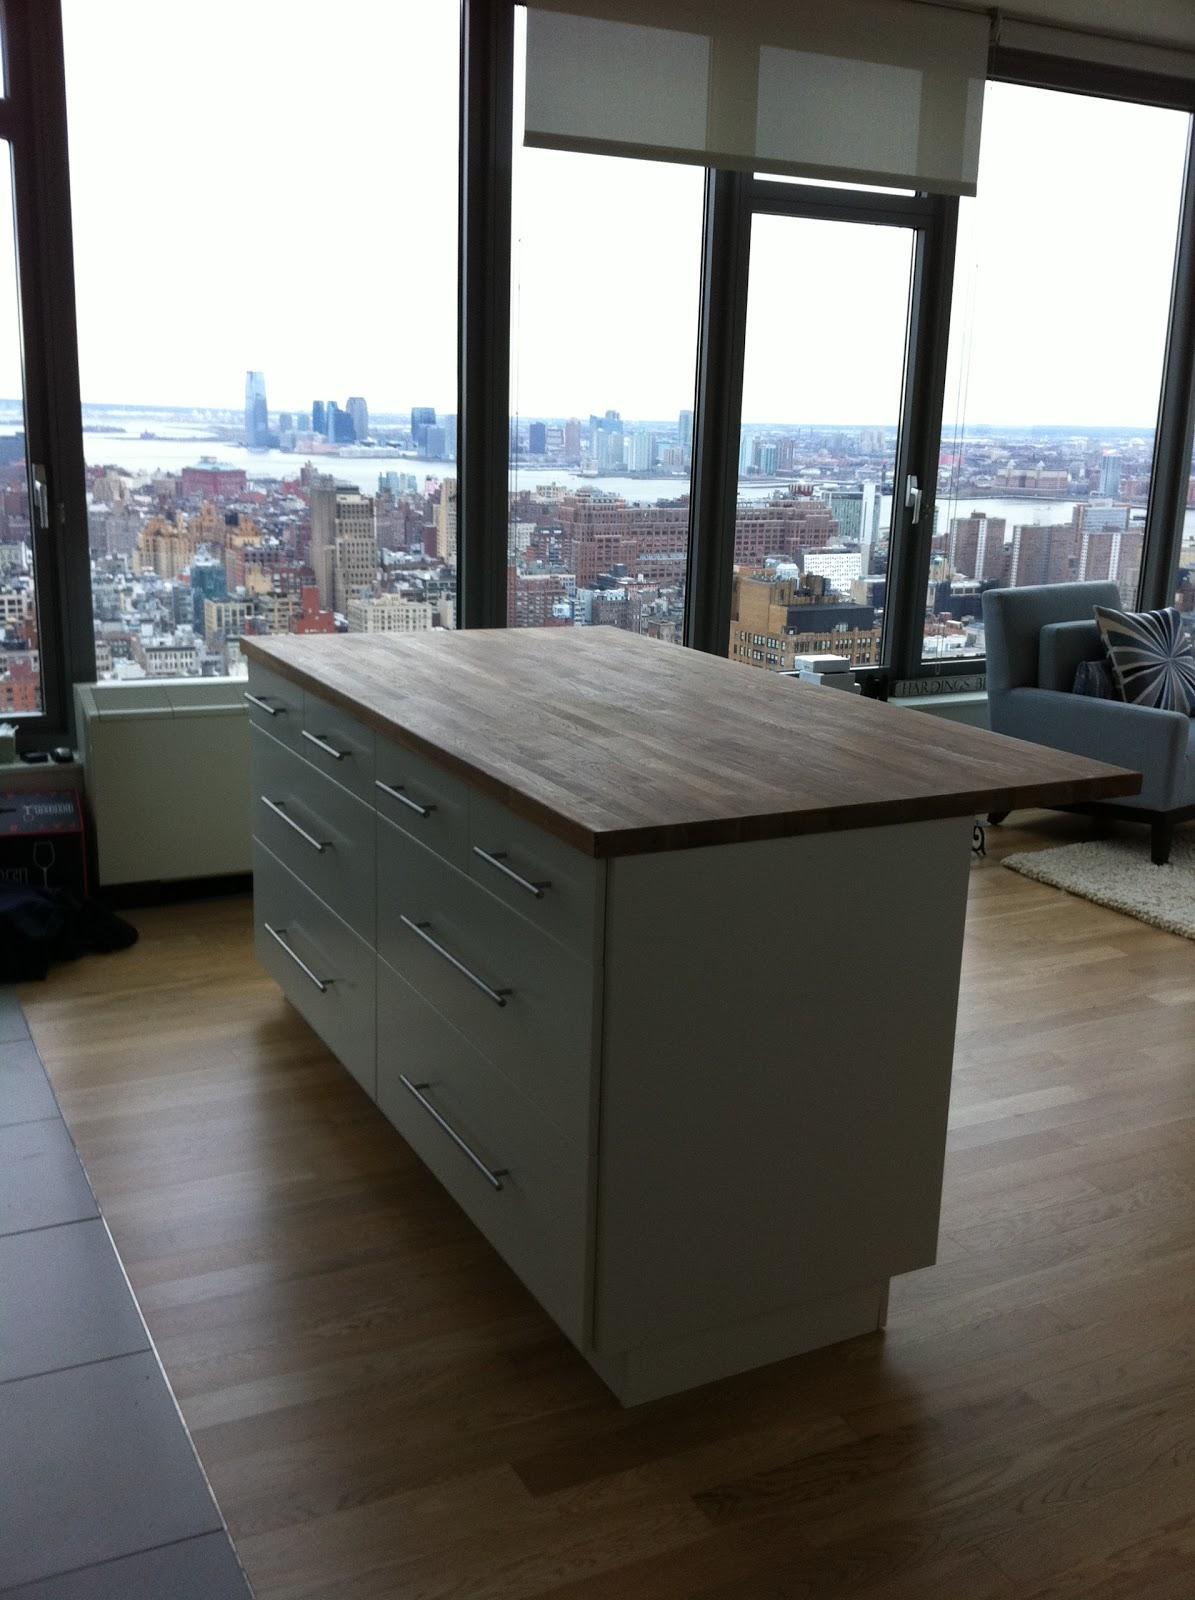 ikea kitchen islands kitchen island table ikea Furniture Assembly Blog Home Improvement IKEA Furniture chat